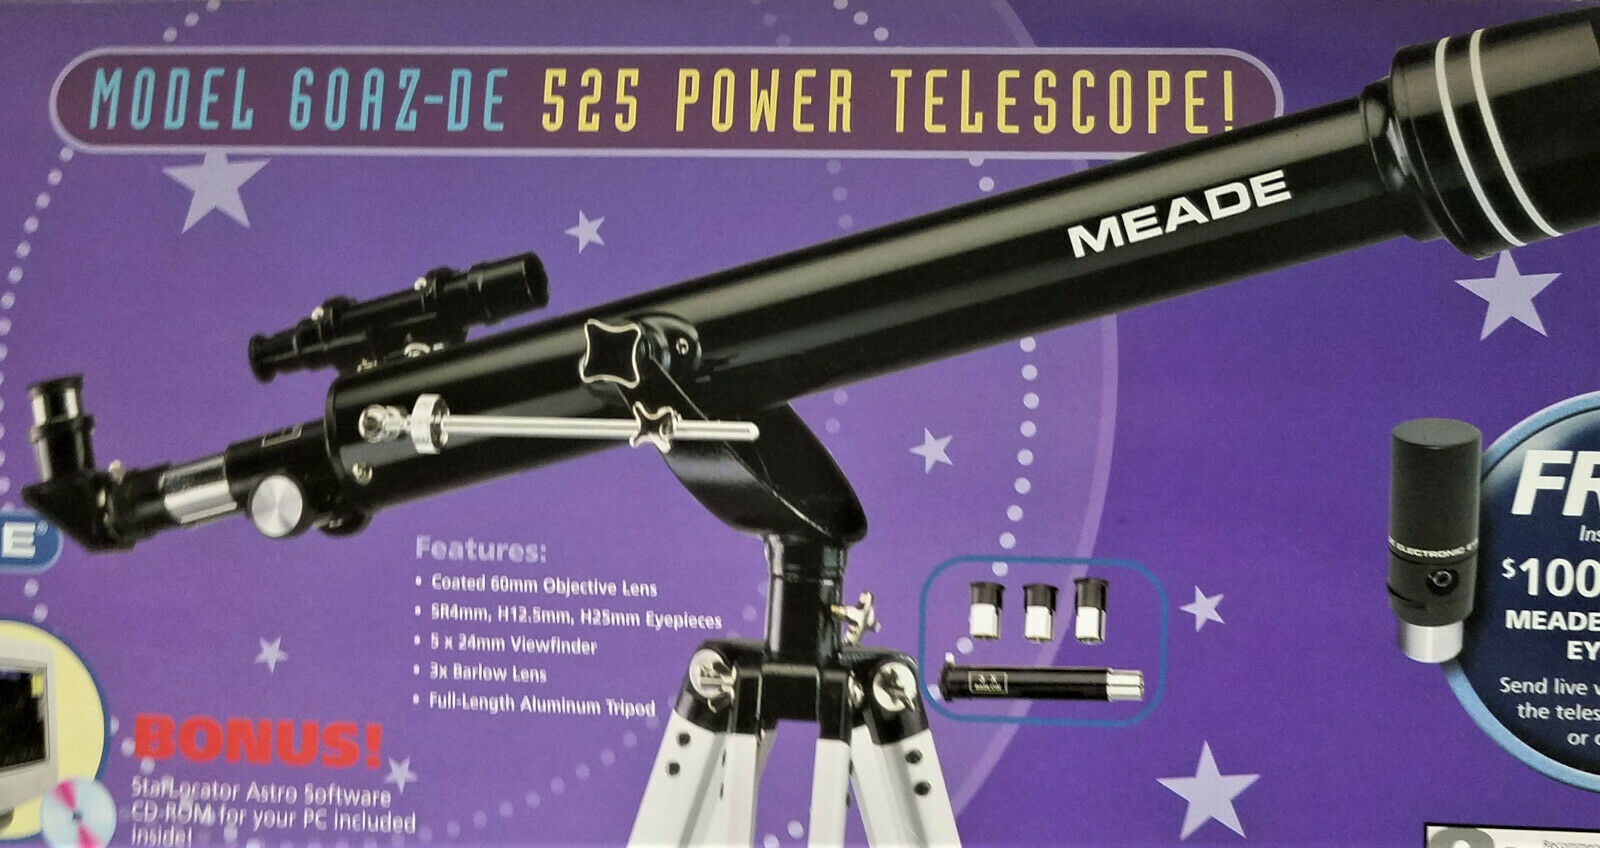 Meade Telescope: 6 listings